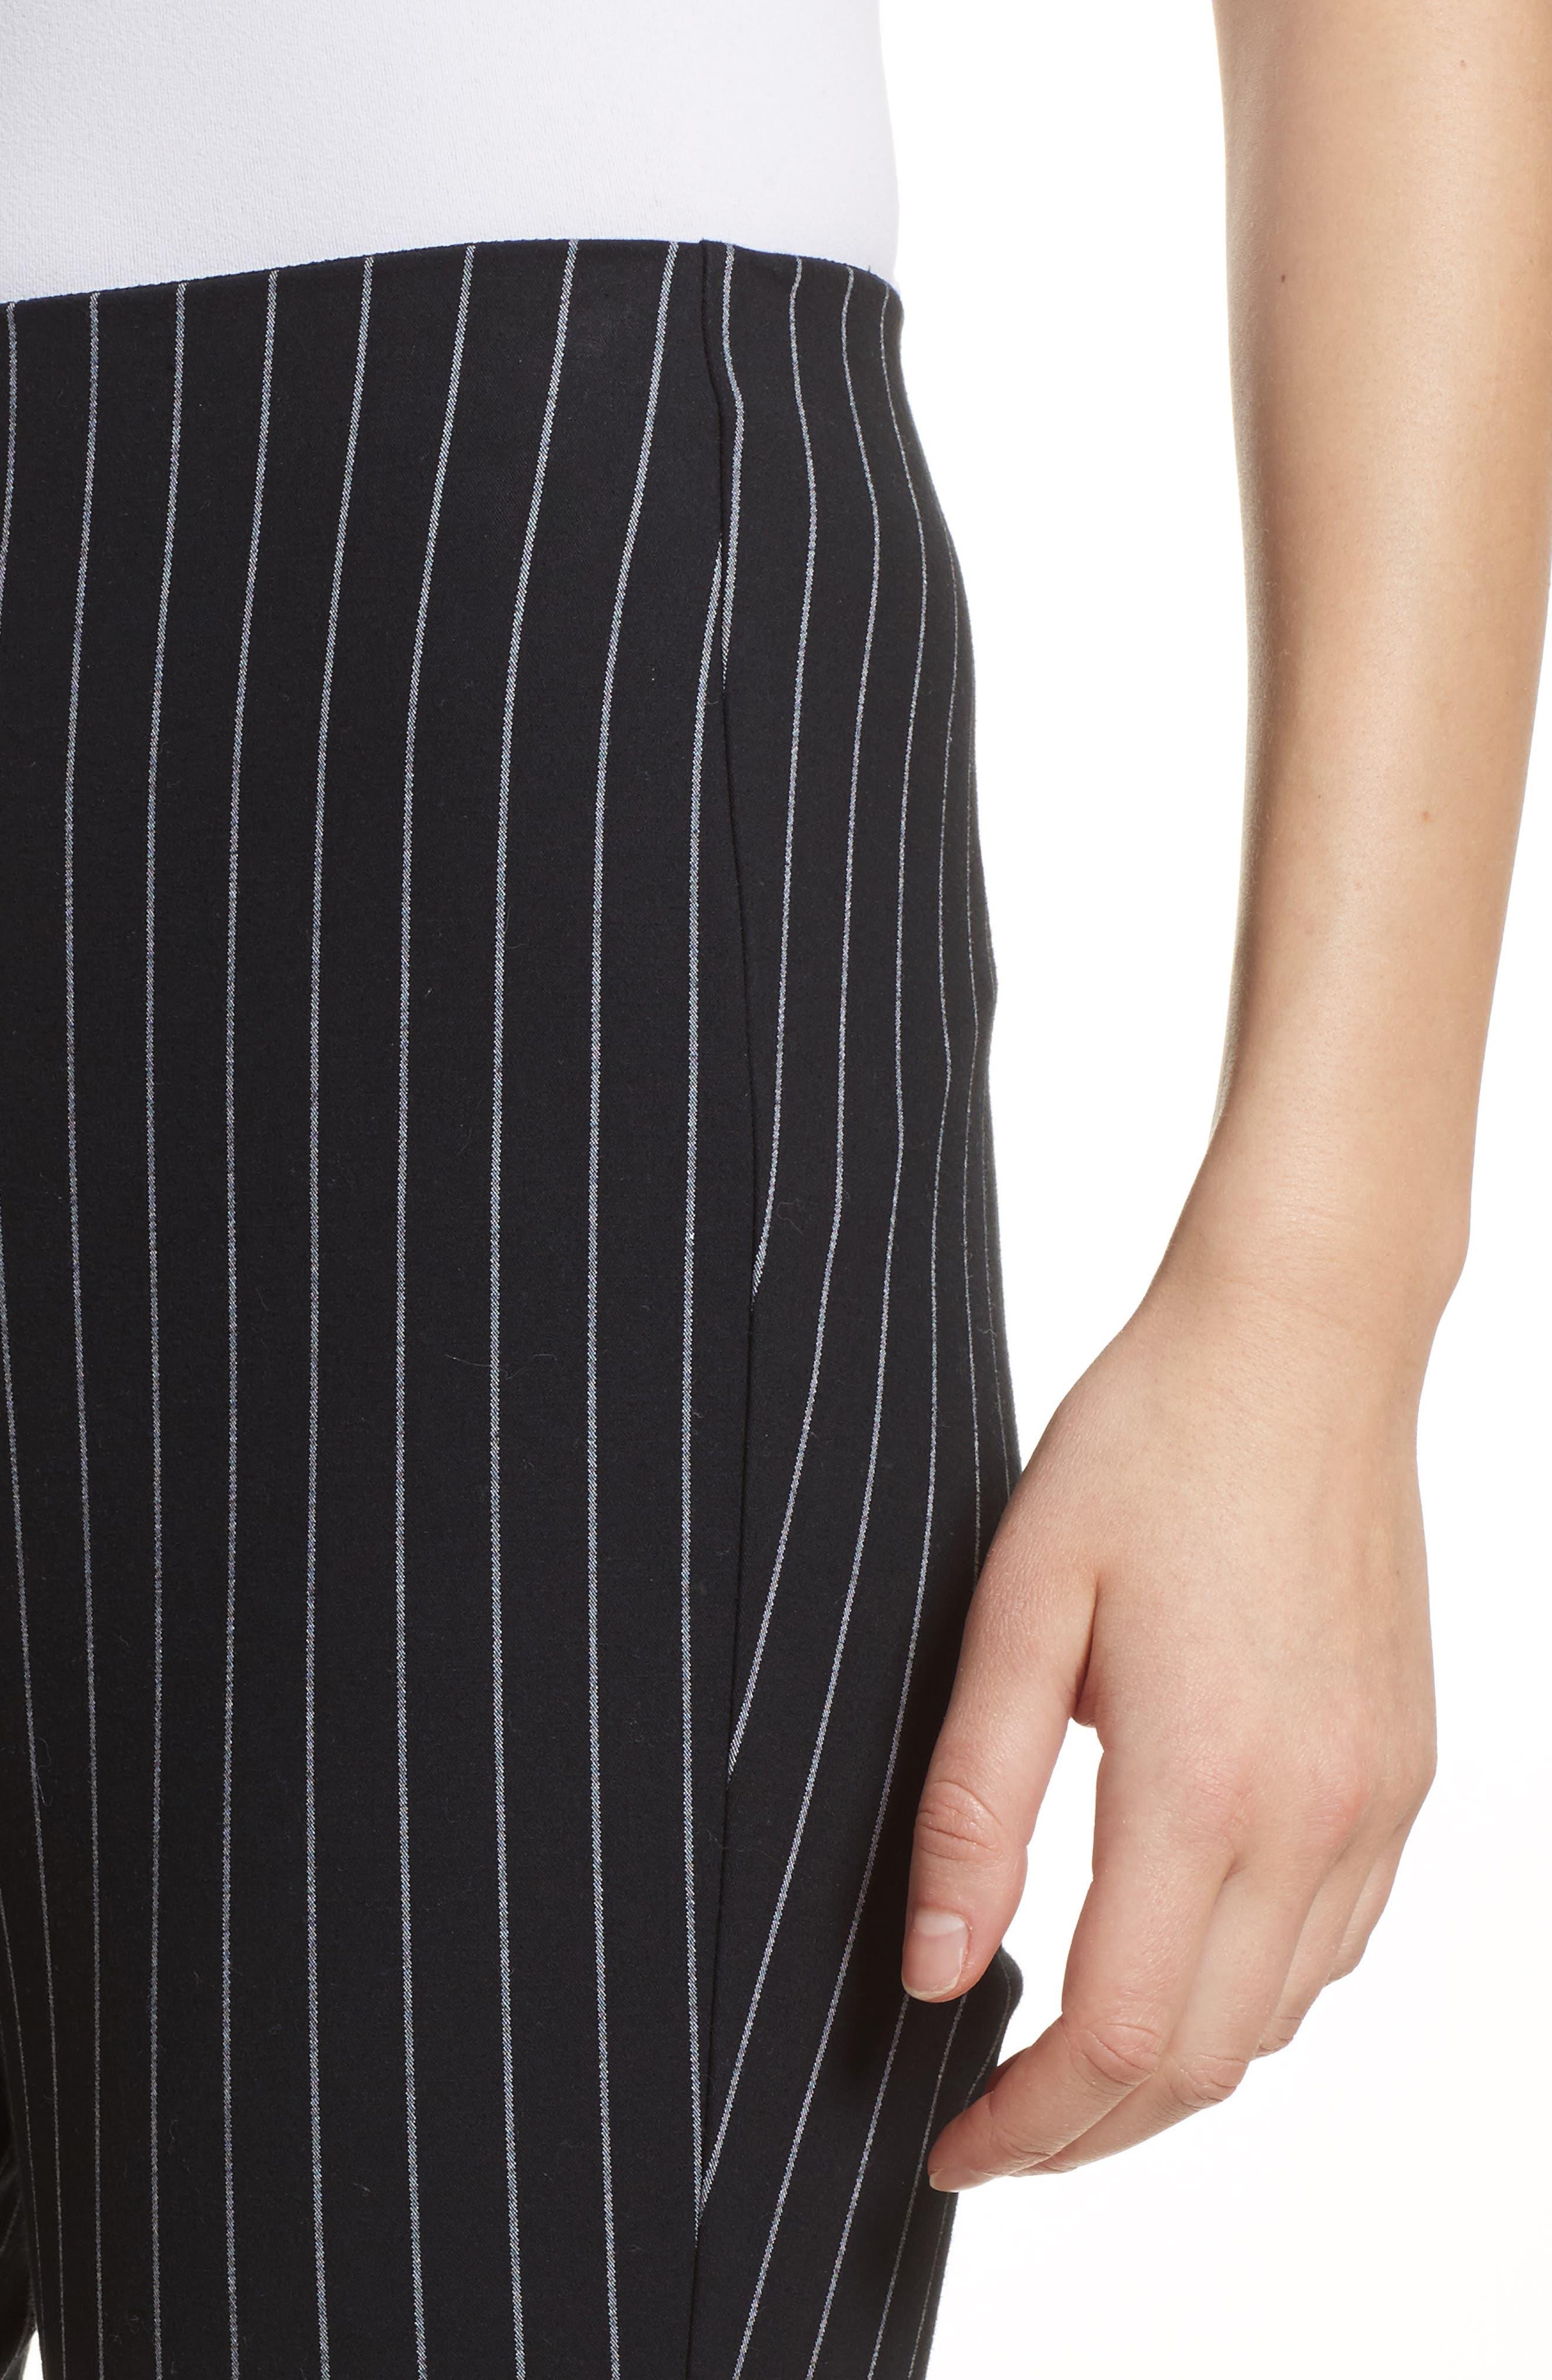 Simone Pinstripe Pants,                             Alternate thumbnail 4, color,                             Black/ White